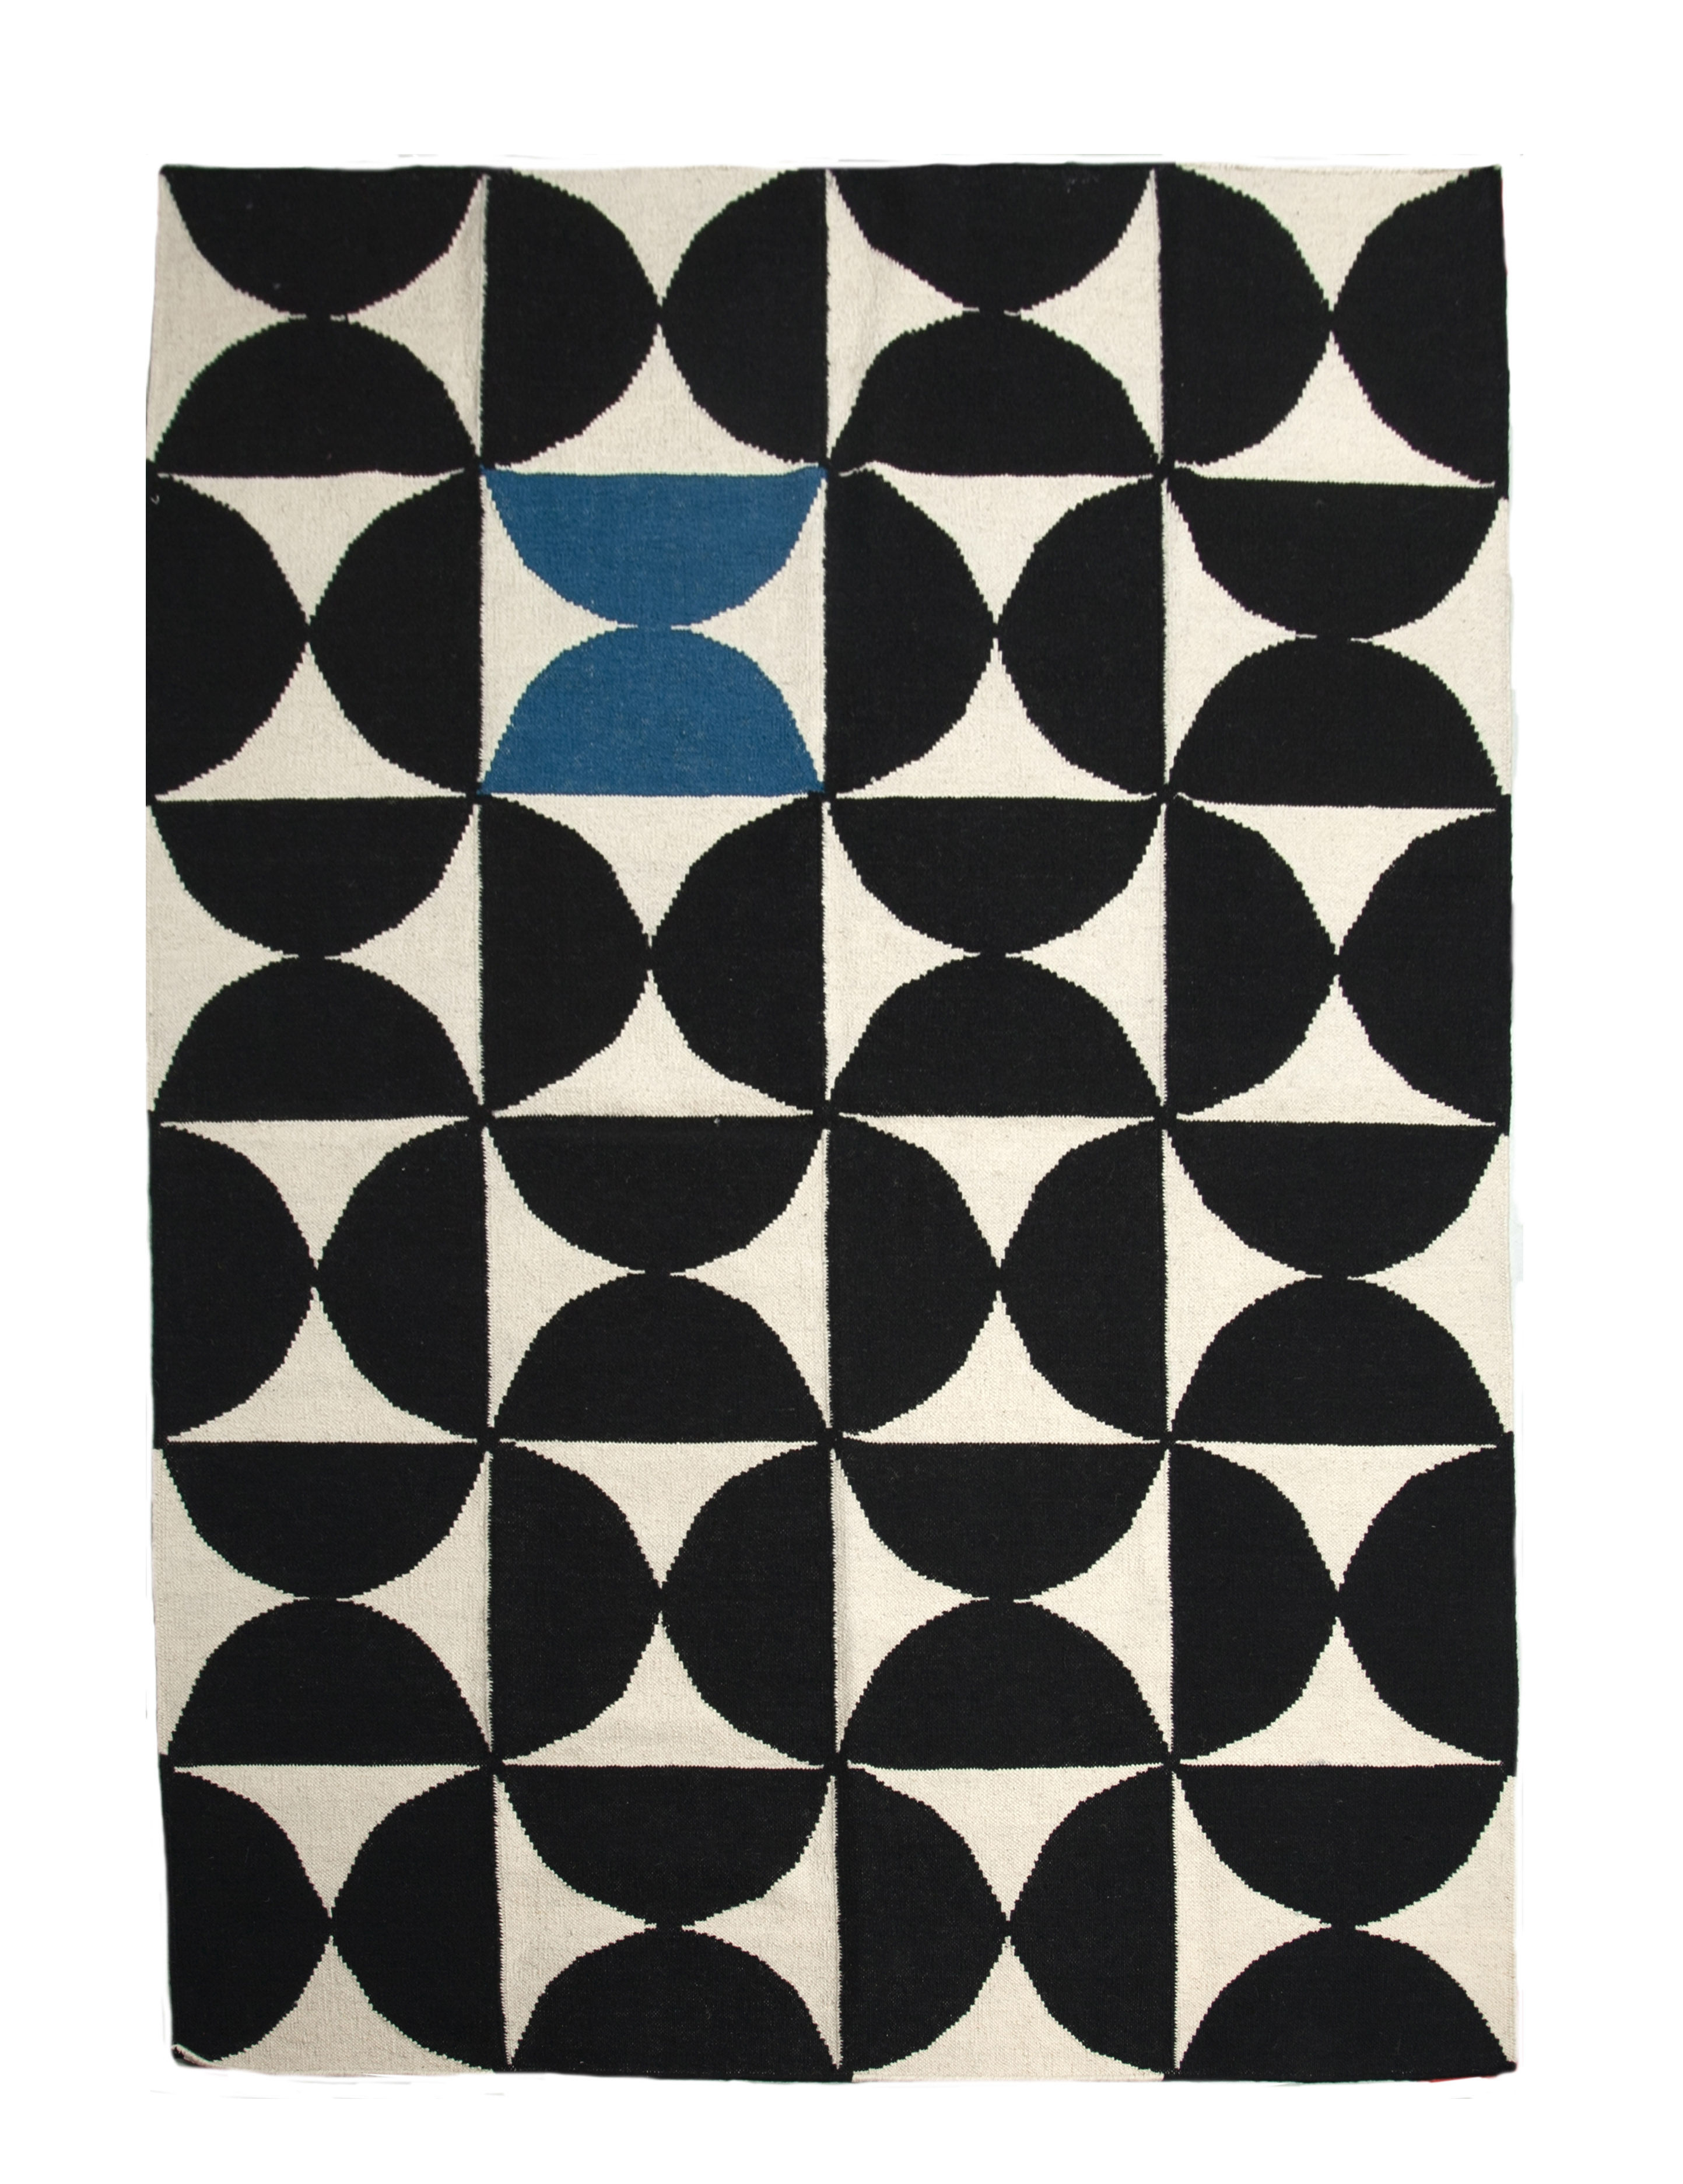 Decoration - Rugs - Alpha Rug - Kilim / 170 x 240 cm by Sentou Edition - Blue / Black & white - Cotton, Wool